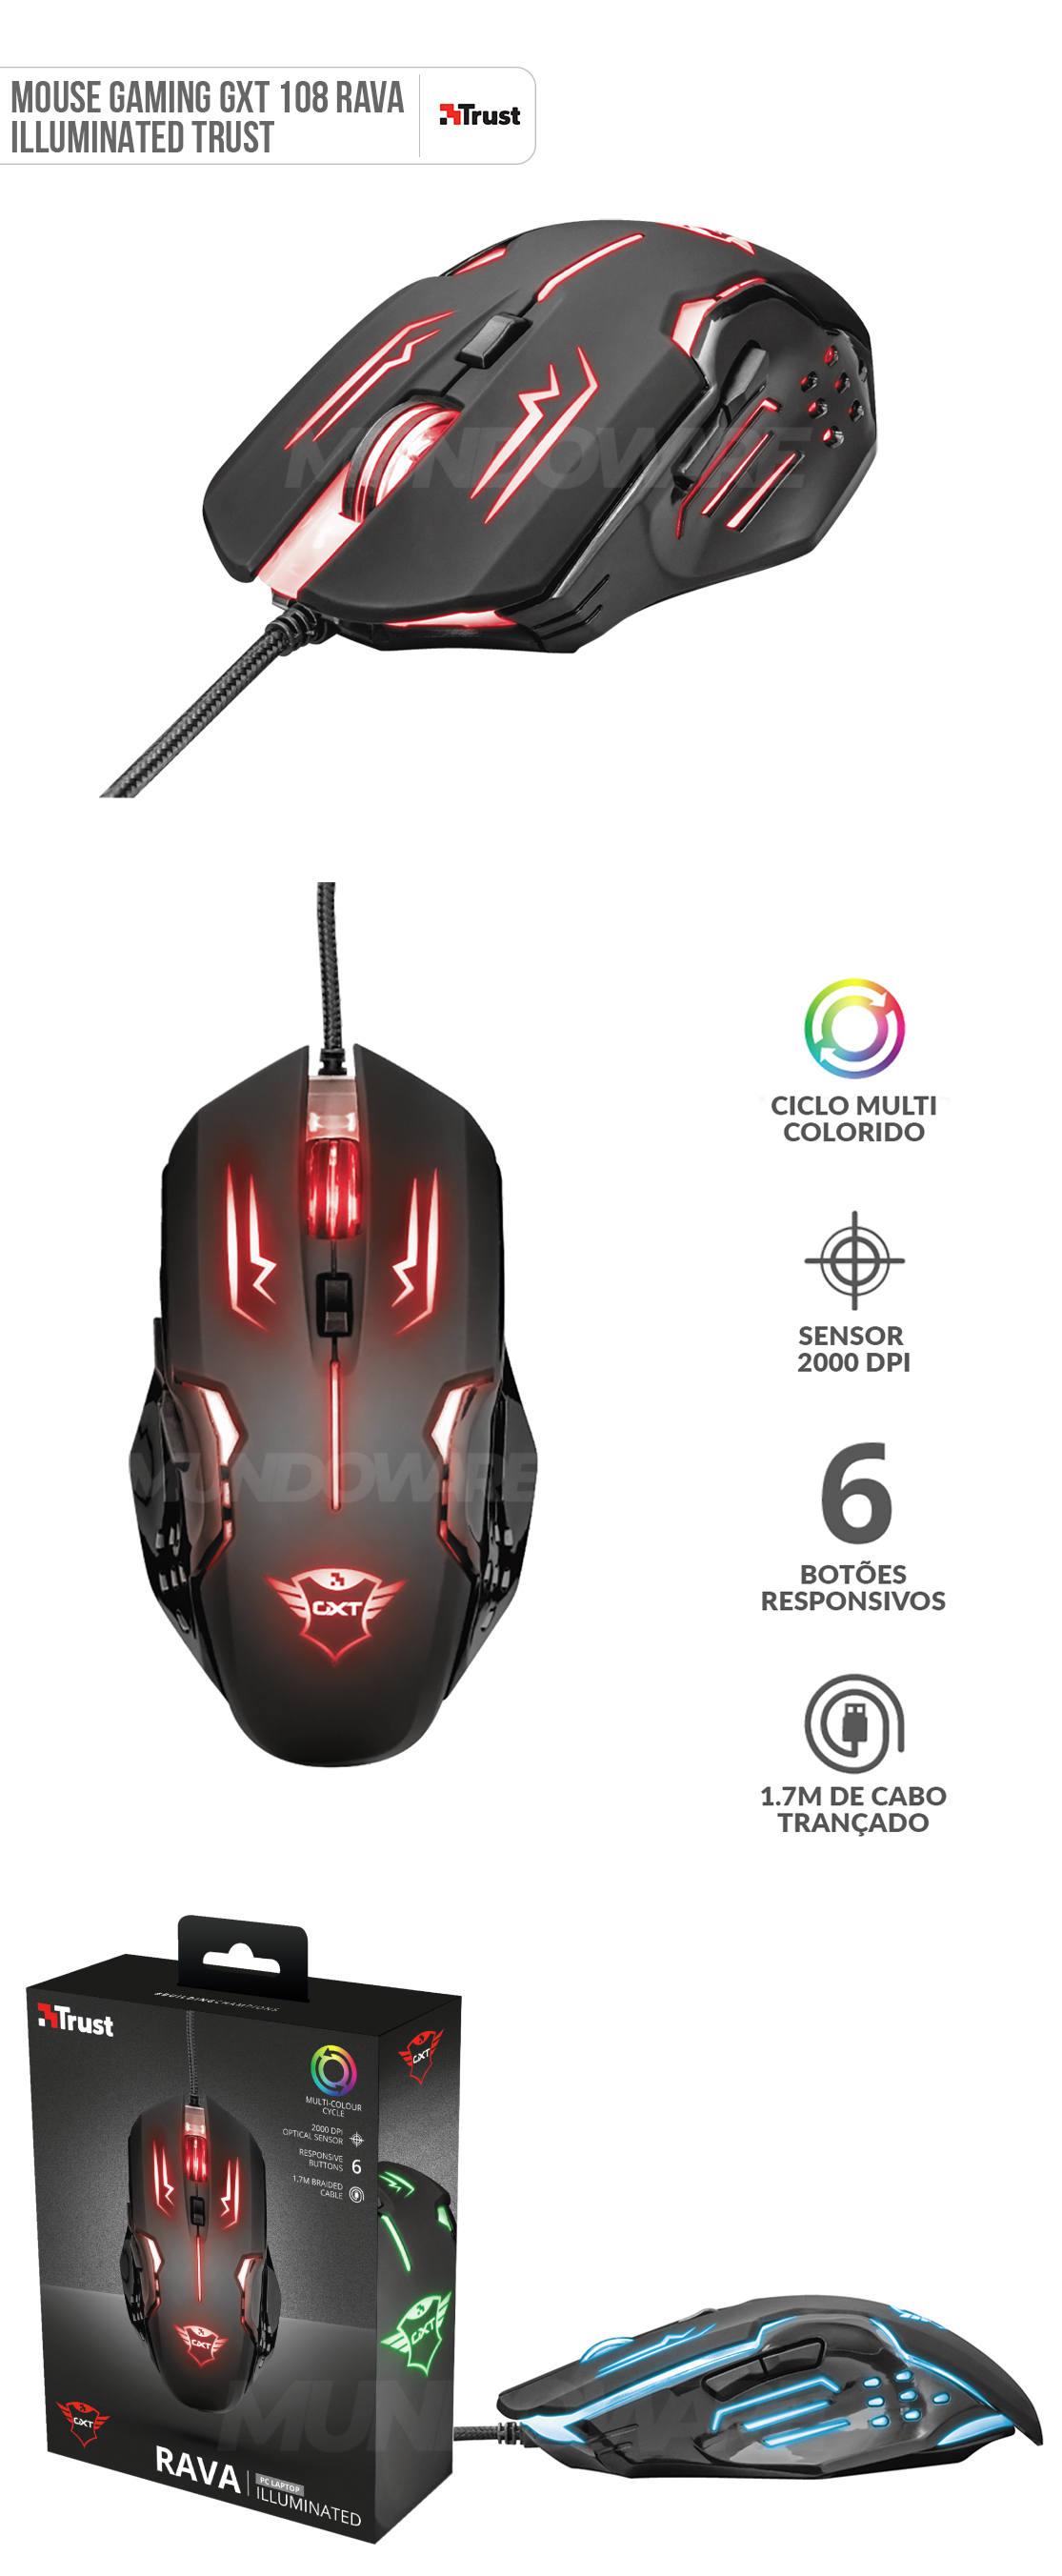 Mouse Gamer GXT 108 Rava Illuminated Gaming 6 Botões Seletor de DPI até 2000 Trust